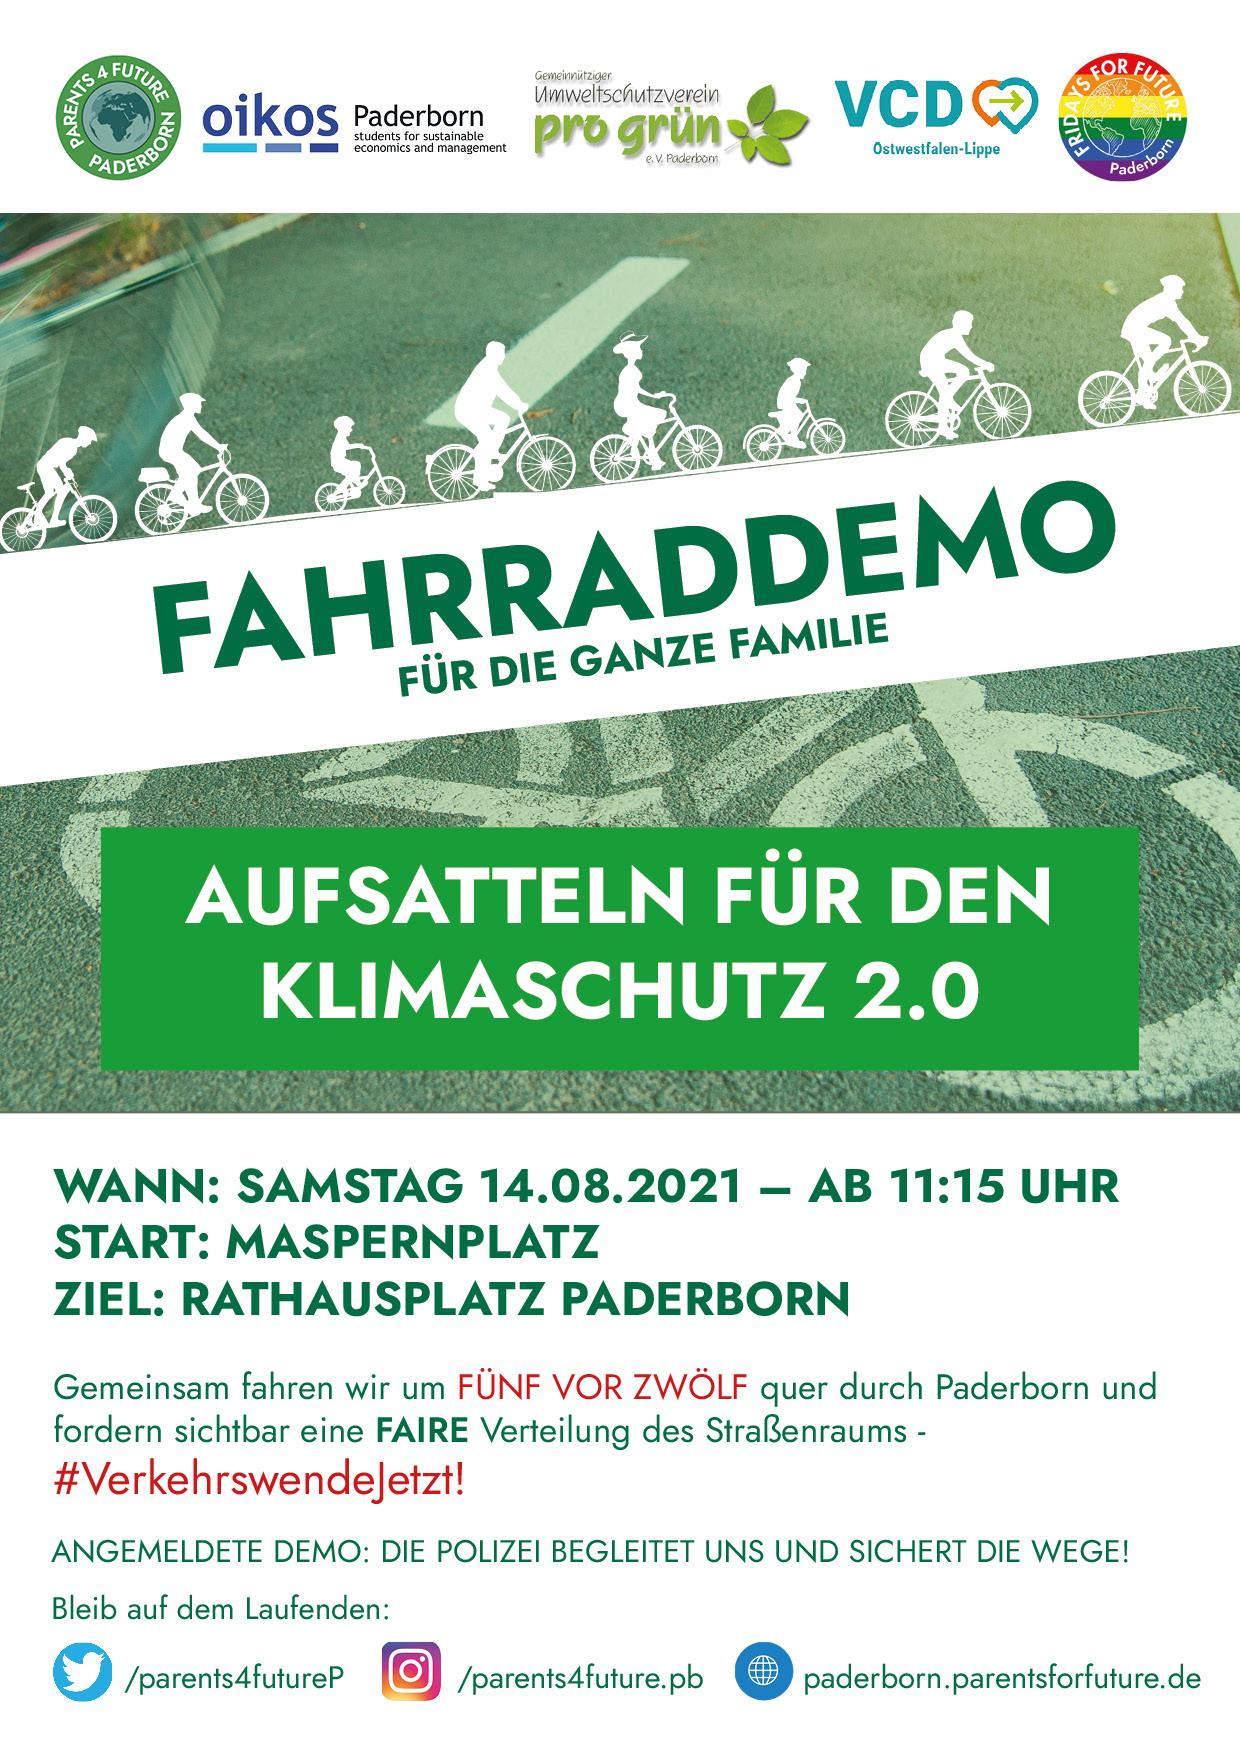 Fahrraddemo Klimaschutz Paderborn